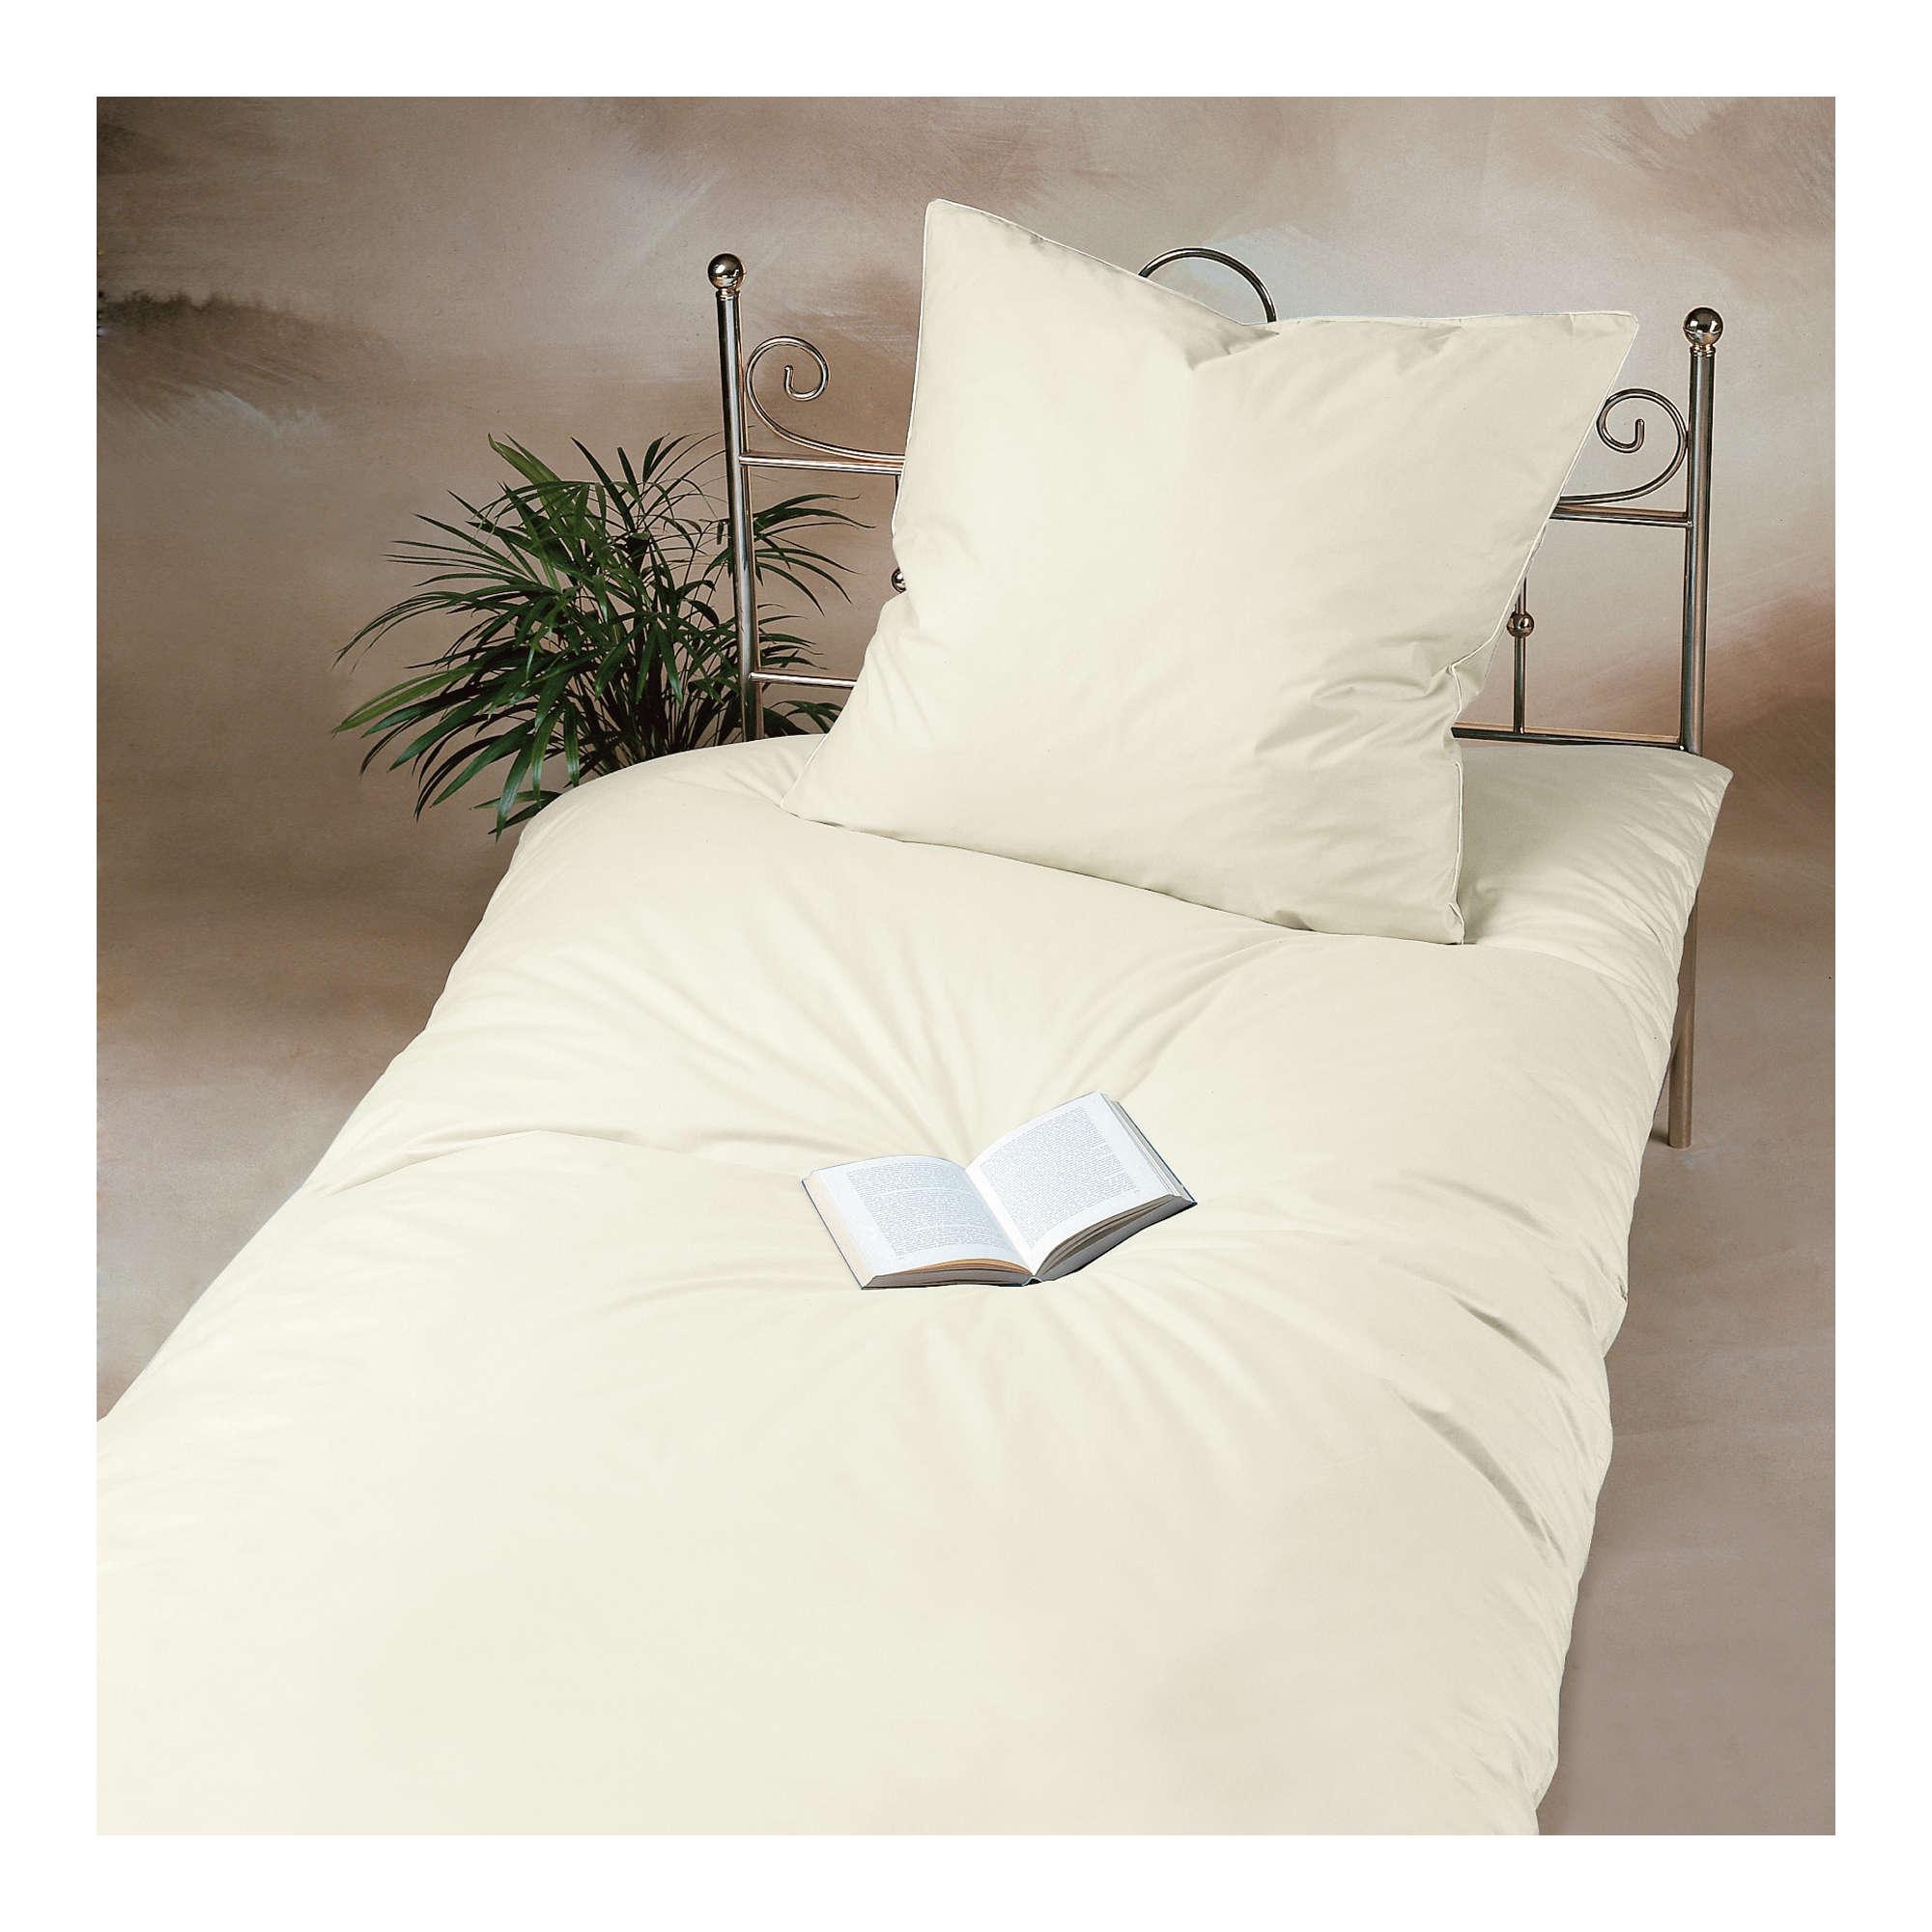 erwin m ller oberbett daunen feder ebay. Black Bedroom Furniture Sets. Home Design Ideas